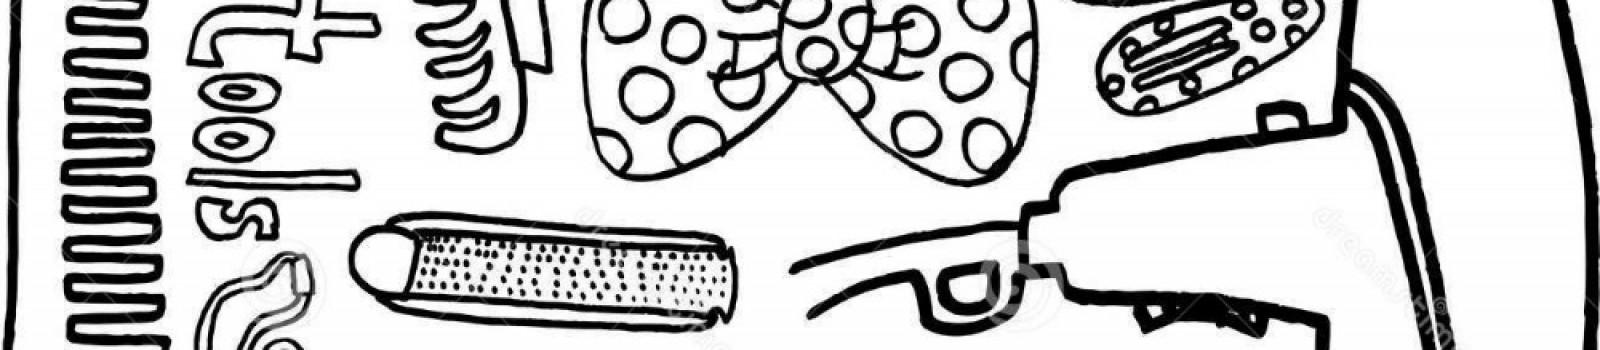 hair-tools-5972012